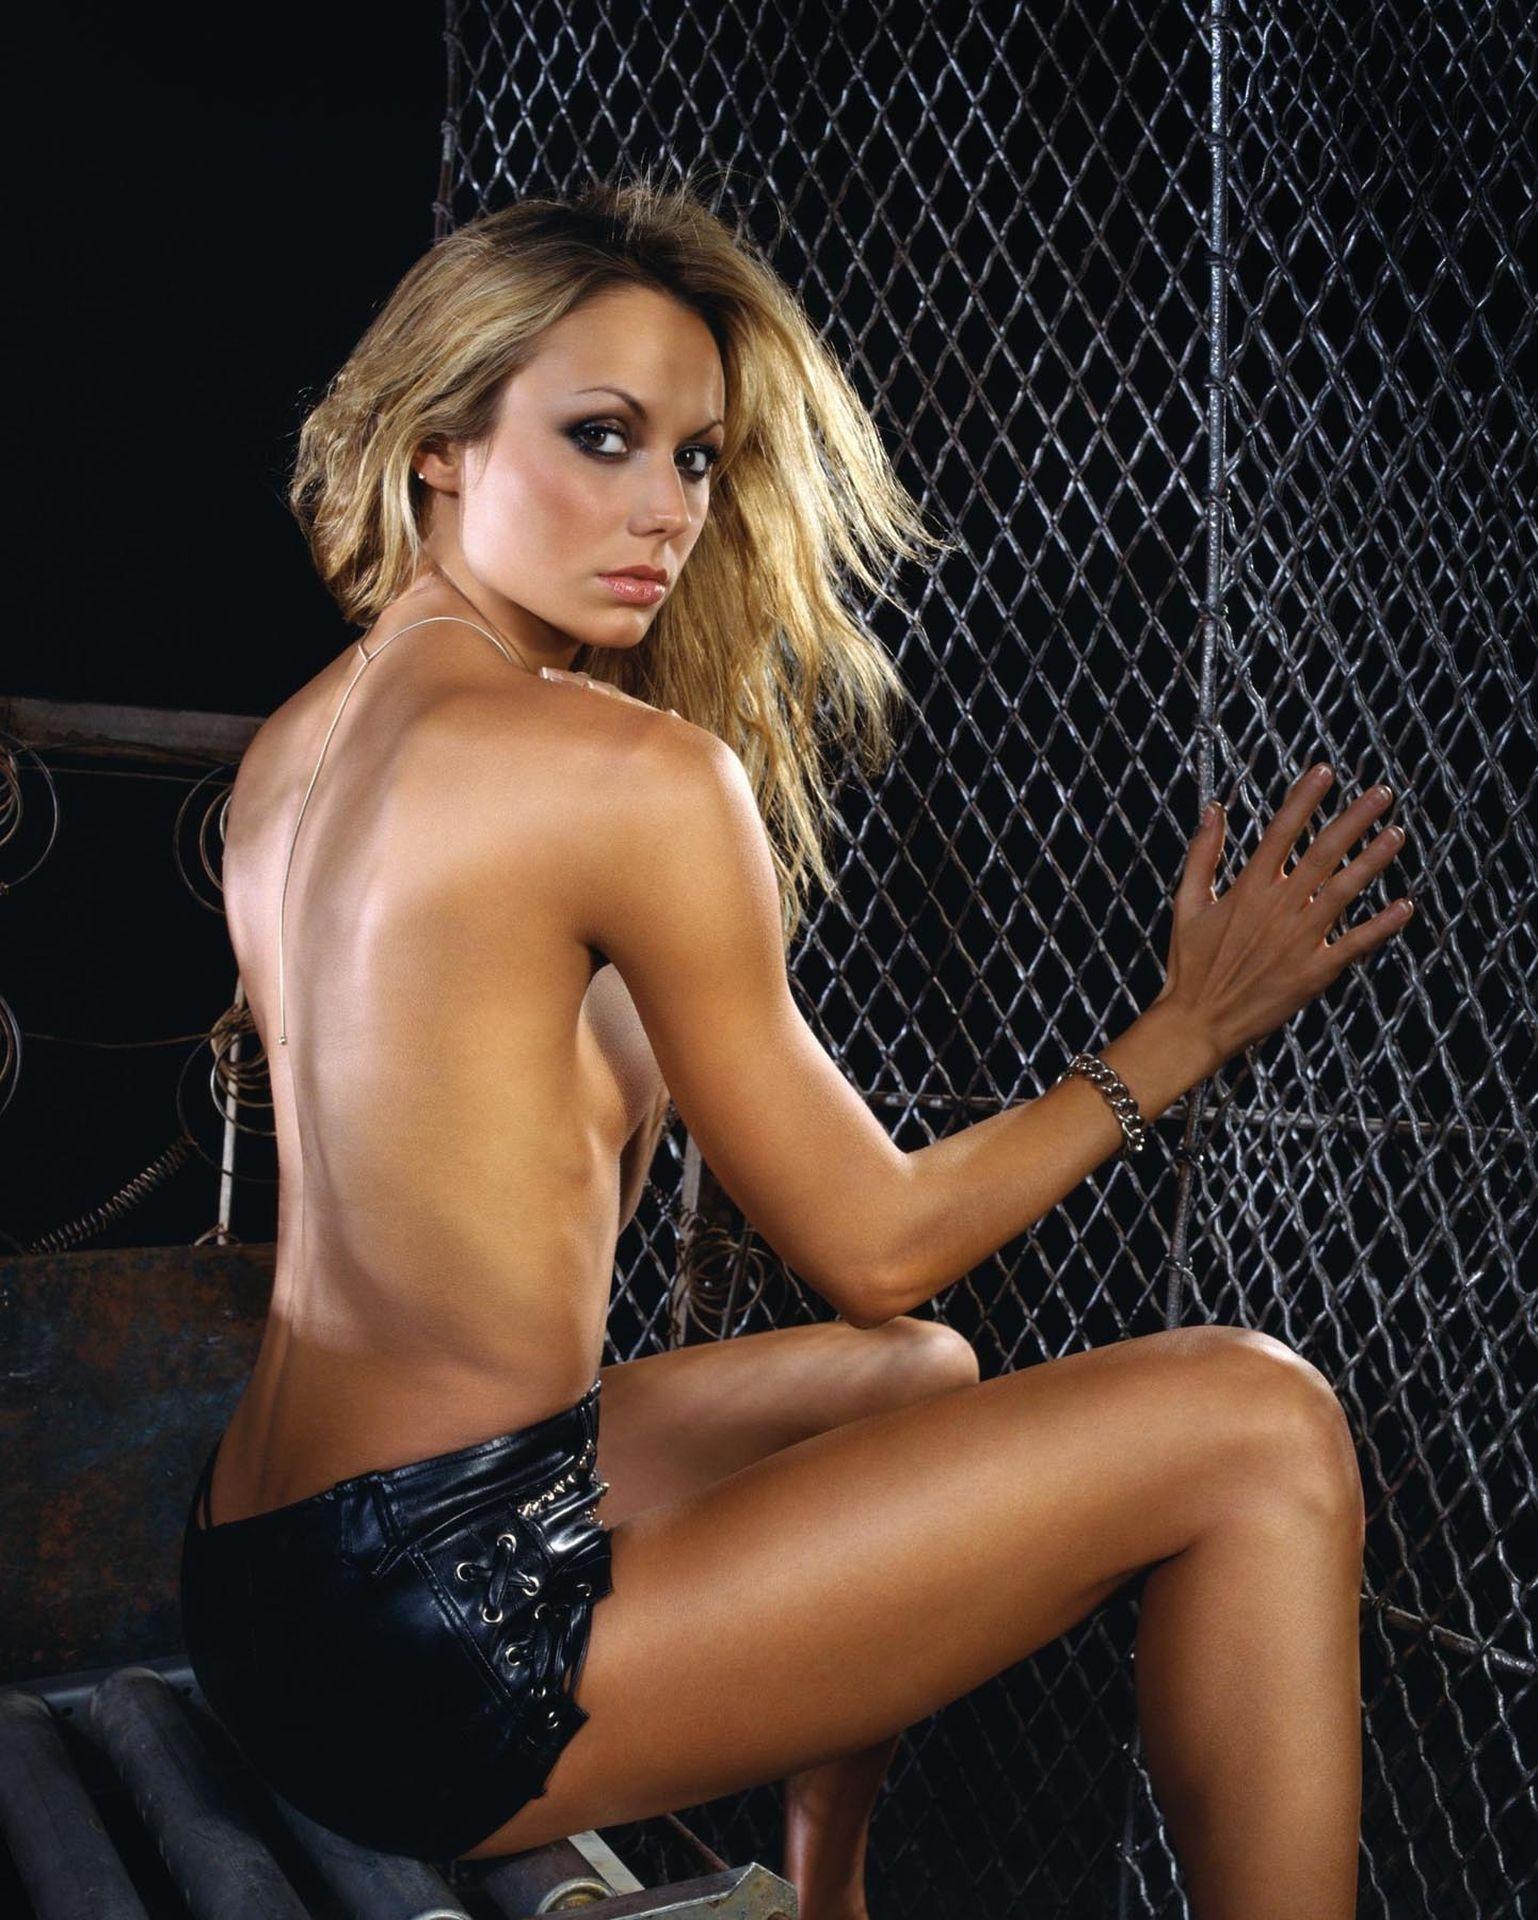 stacy-keibler-nude-sexy-3-thefappeningblog.com_.jpg